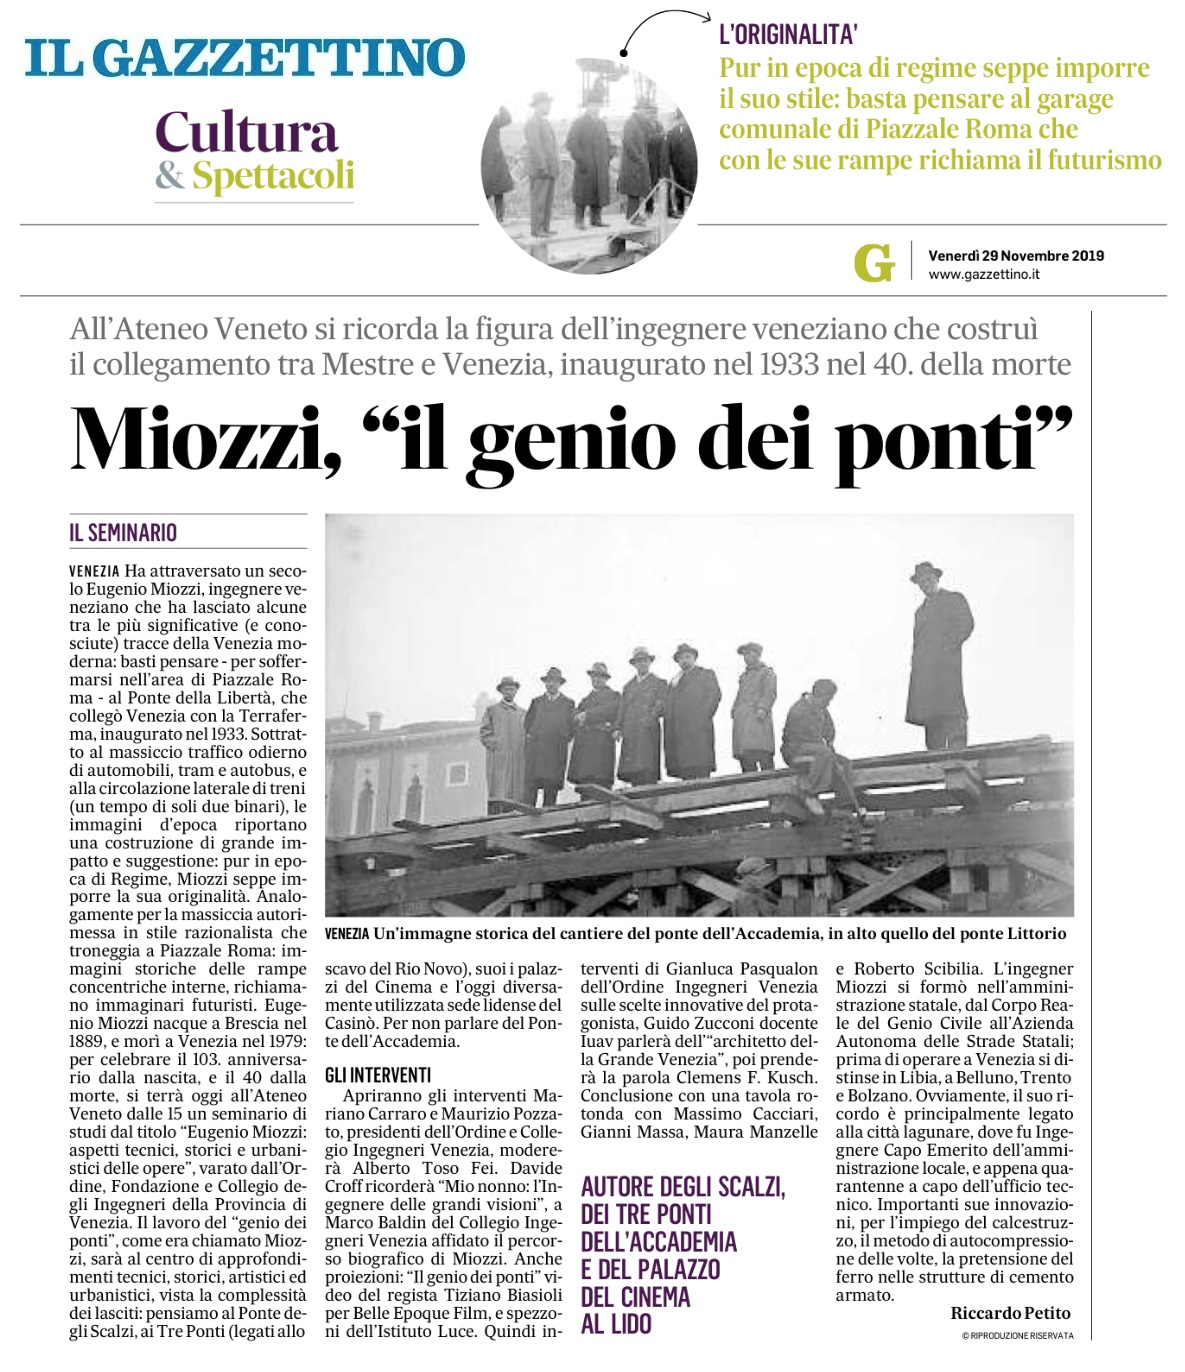 28.11.2019  IL GAZZETTINO - seminario ing. Eugenio Miozzi Ordine Collegio Ingegneri Venezia Ateneo Veneto.jpg